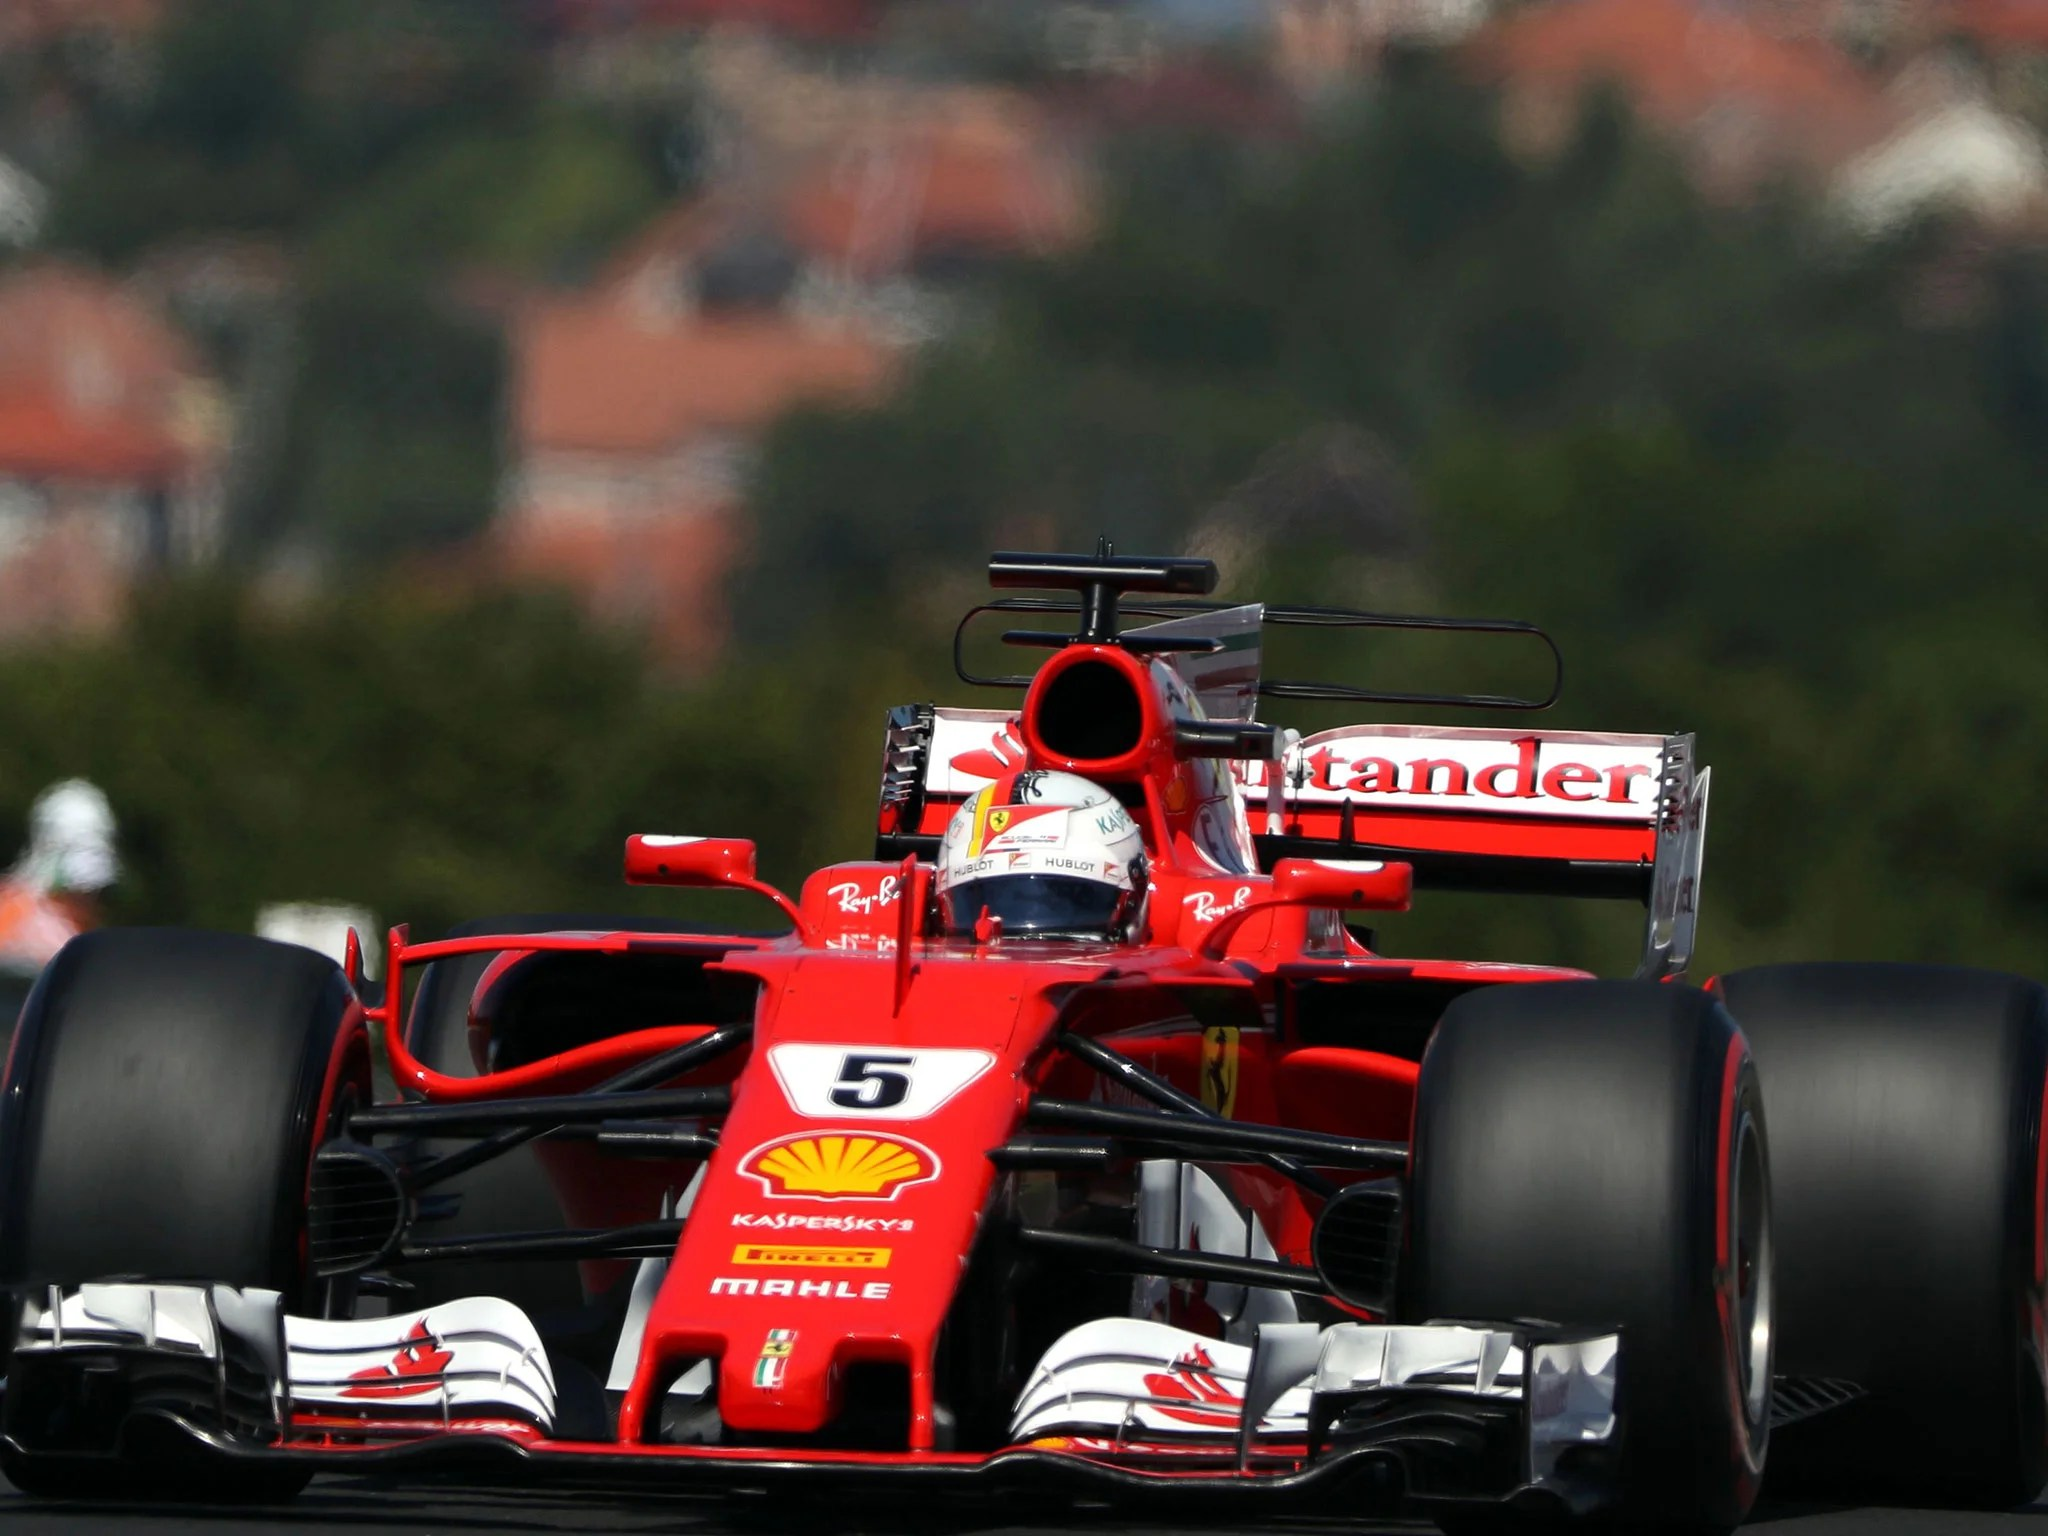 Lewis Hamilton F1 Car Wallpaper Hungarian Grand Prix 2017 Sebastian Vettel Leads Ferrari